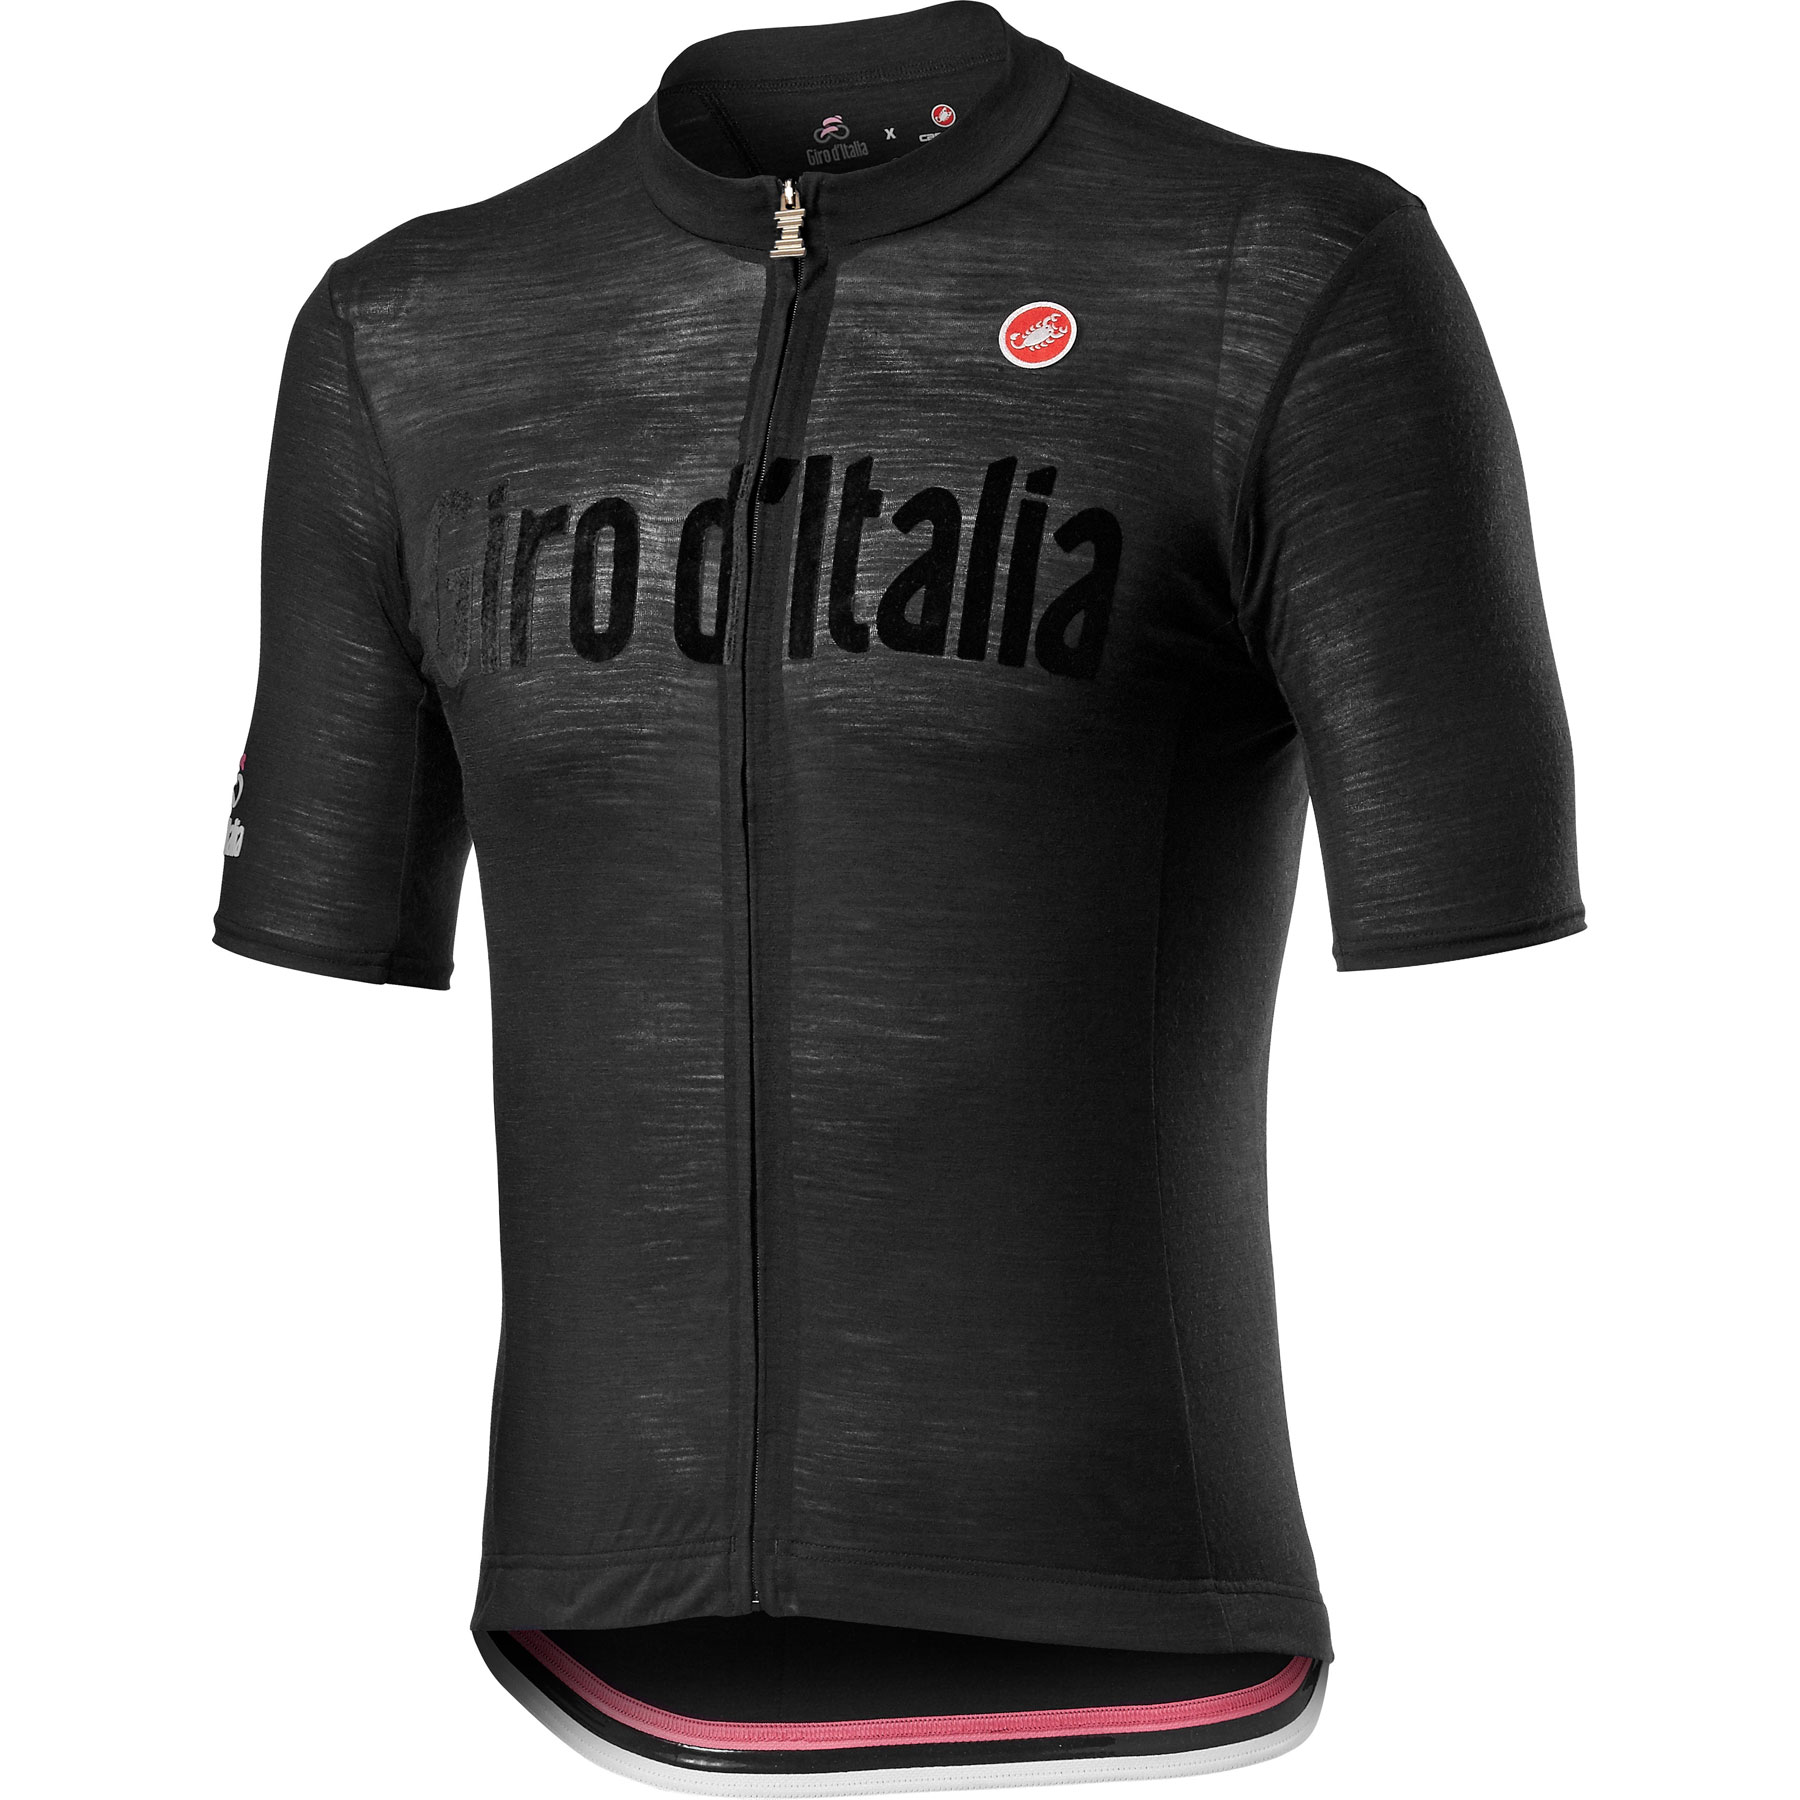 Castelli Giro d'Italia 2021 Heritage Maglia Nera Jersey - nero vintage 085